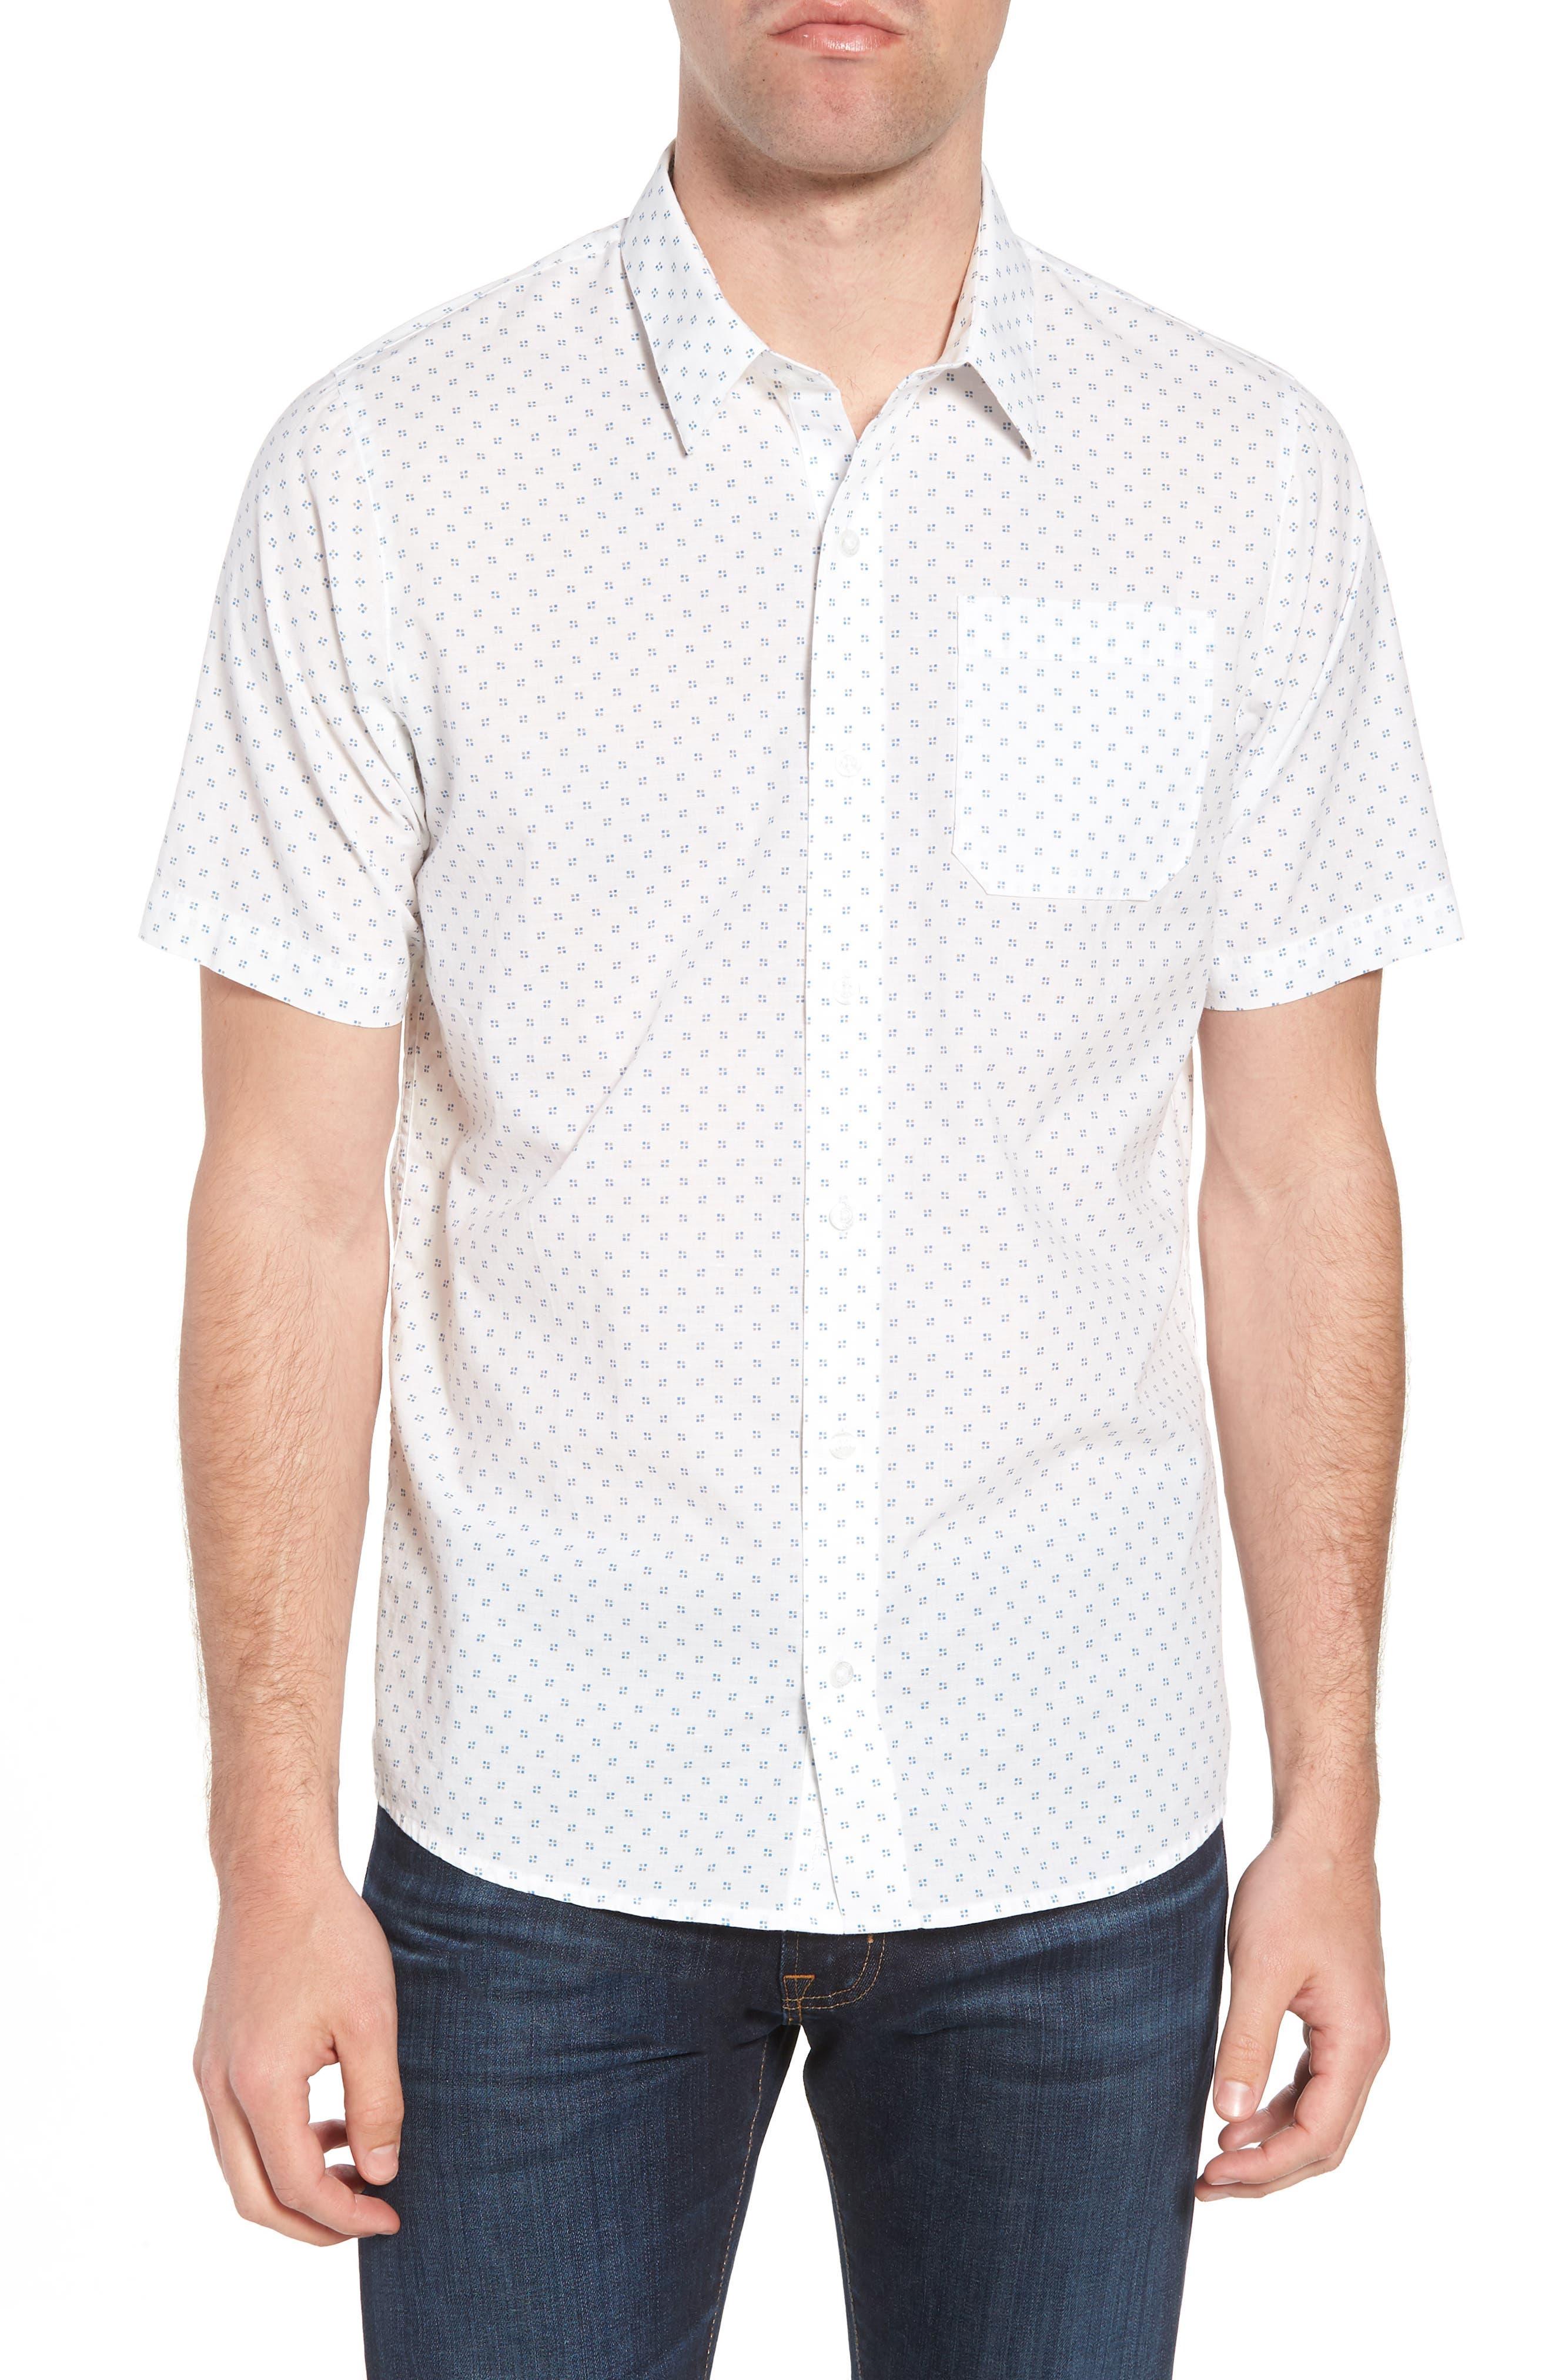 Nangs Print Sport Shirt,                             Main thumbnail 1, color,                             White